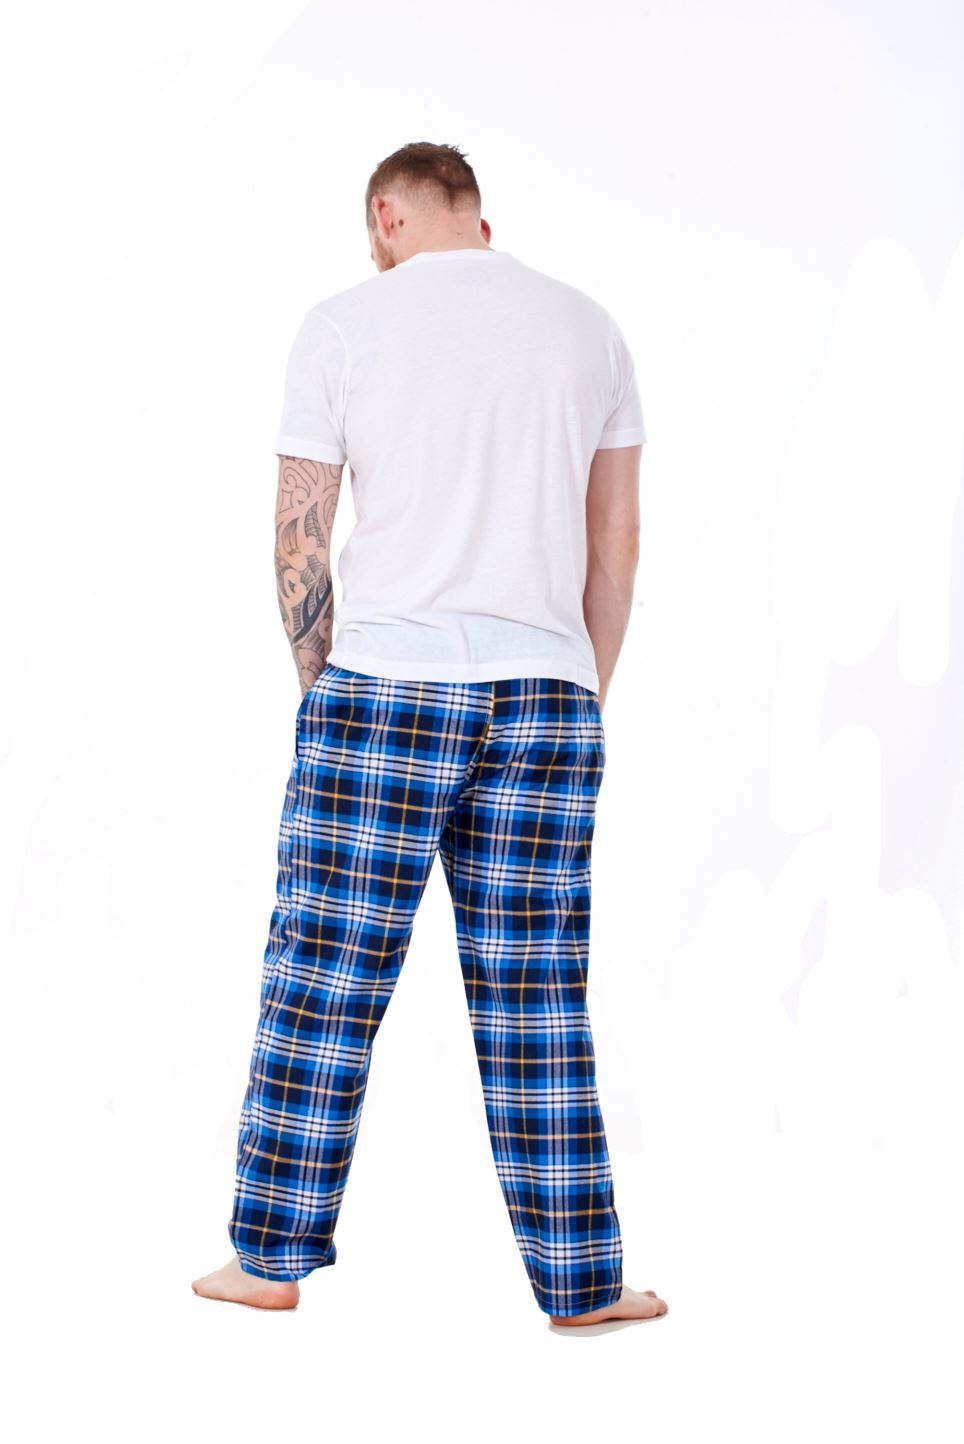 Mens-Pyjama-Bottoms-Rich-Cotton-Woven-Check-Lounge-Pant-Nightwear-Big-3XL-to-5XL Indexbild 60